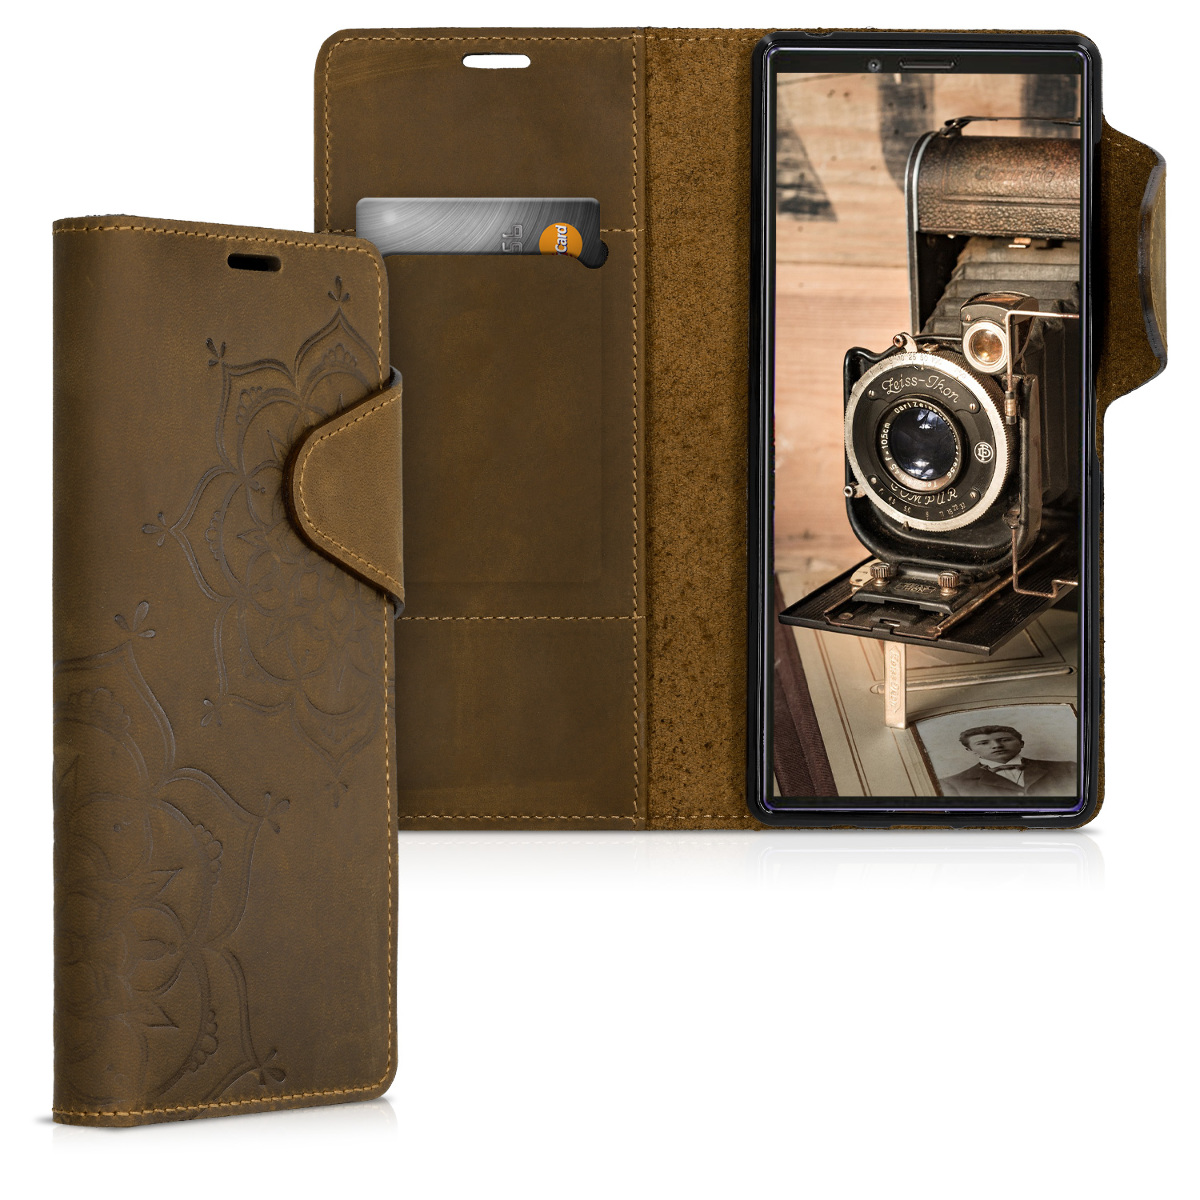 Kalibri Δερμάτινη Suede Θήκη - Πορτοφόλι Sony Xperia 1 - Brown (47991.05)